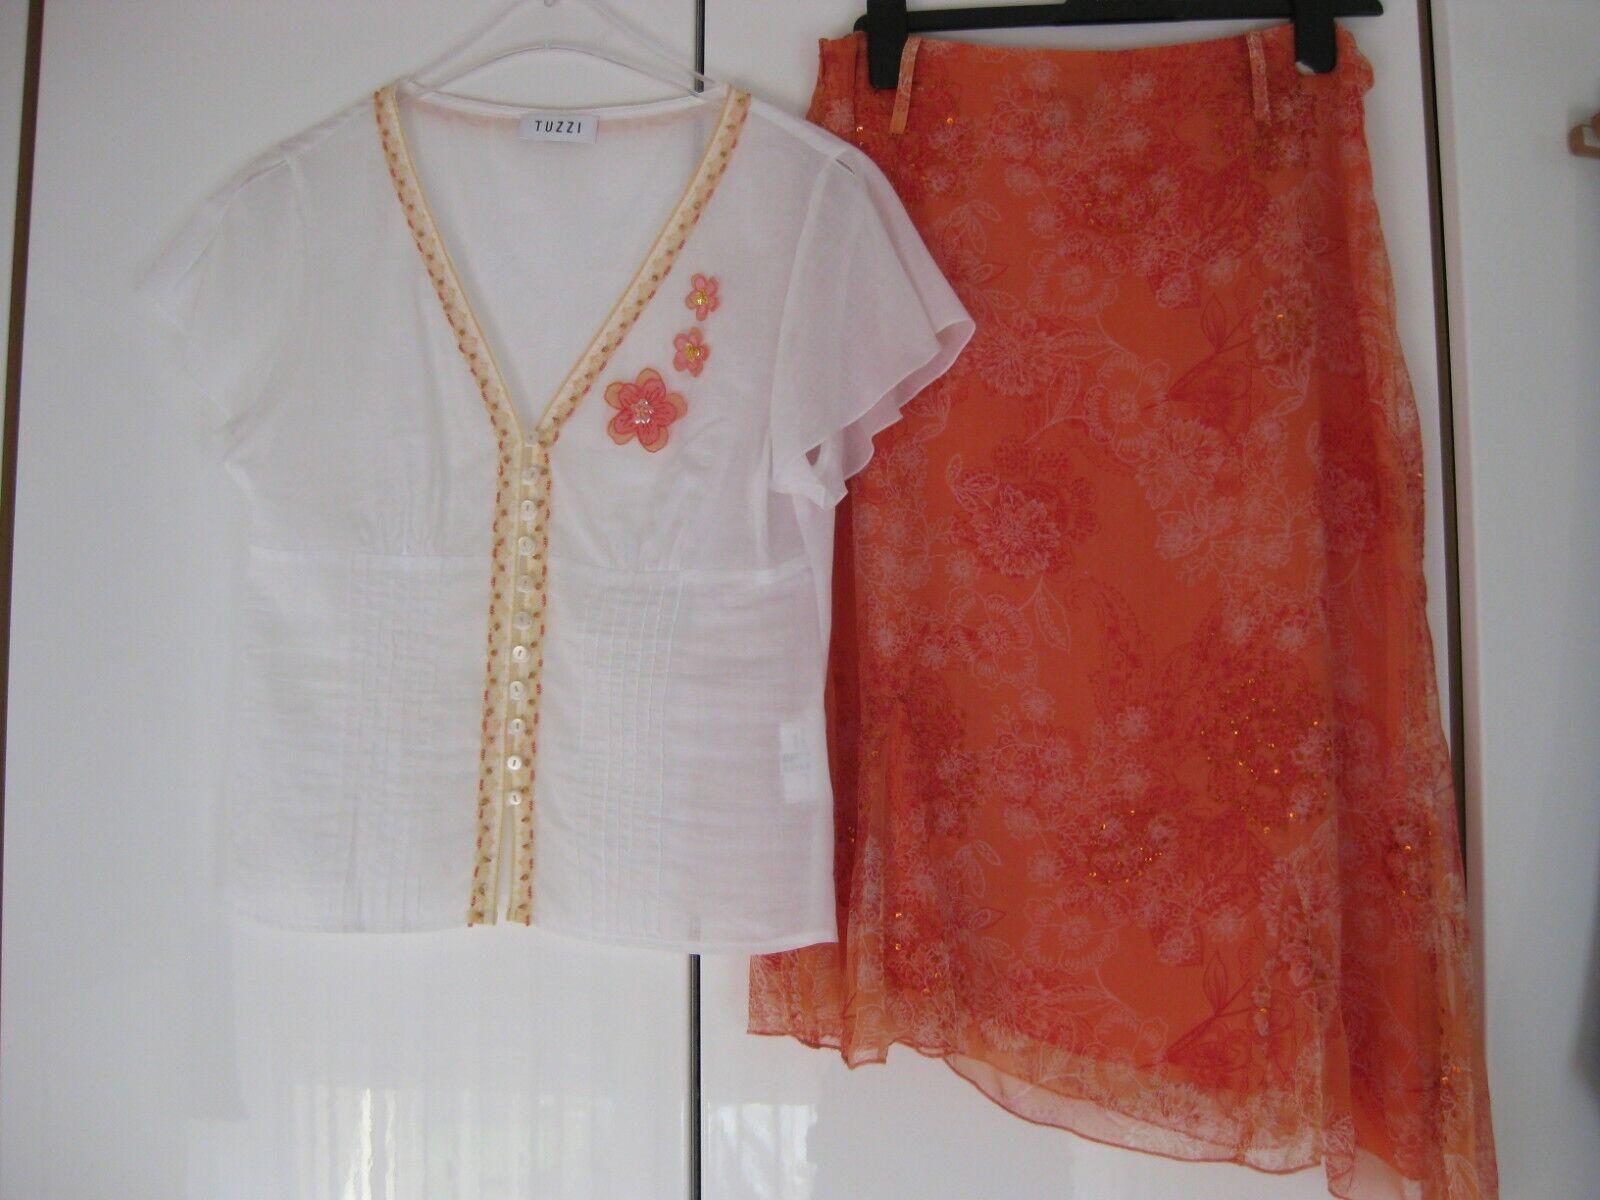 Tuzzi Damen Set Tunika Bluse Rock Pailletten Seide orange weiß Gr. 38 / 40 Neu